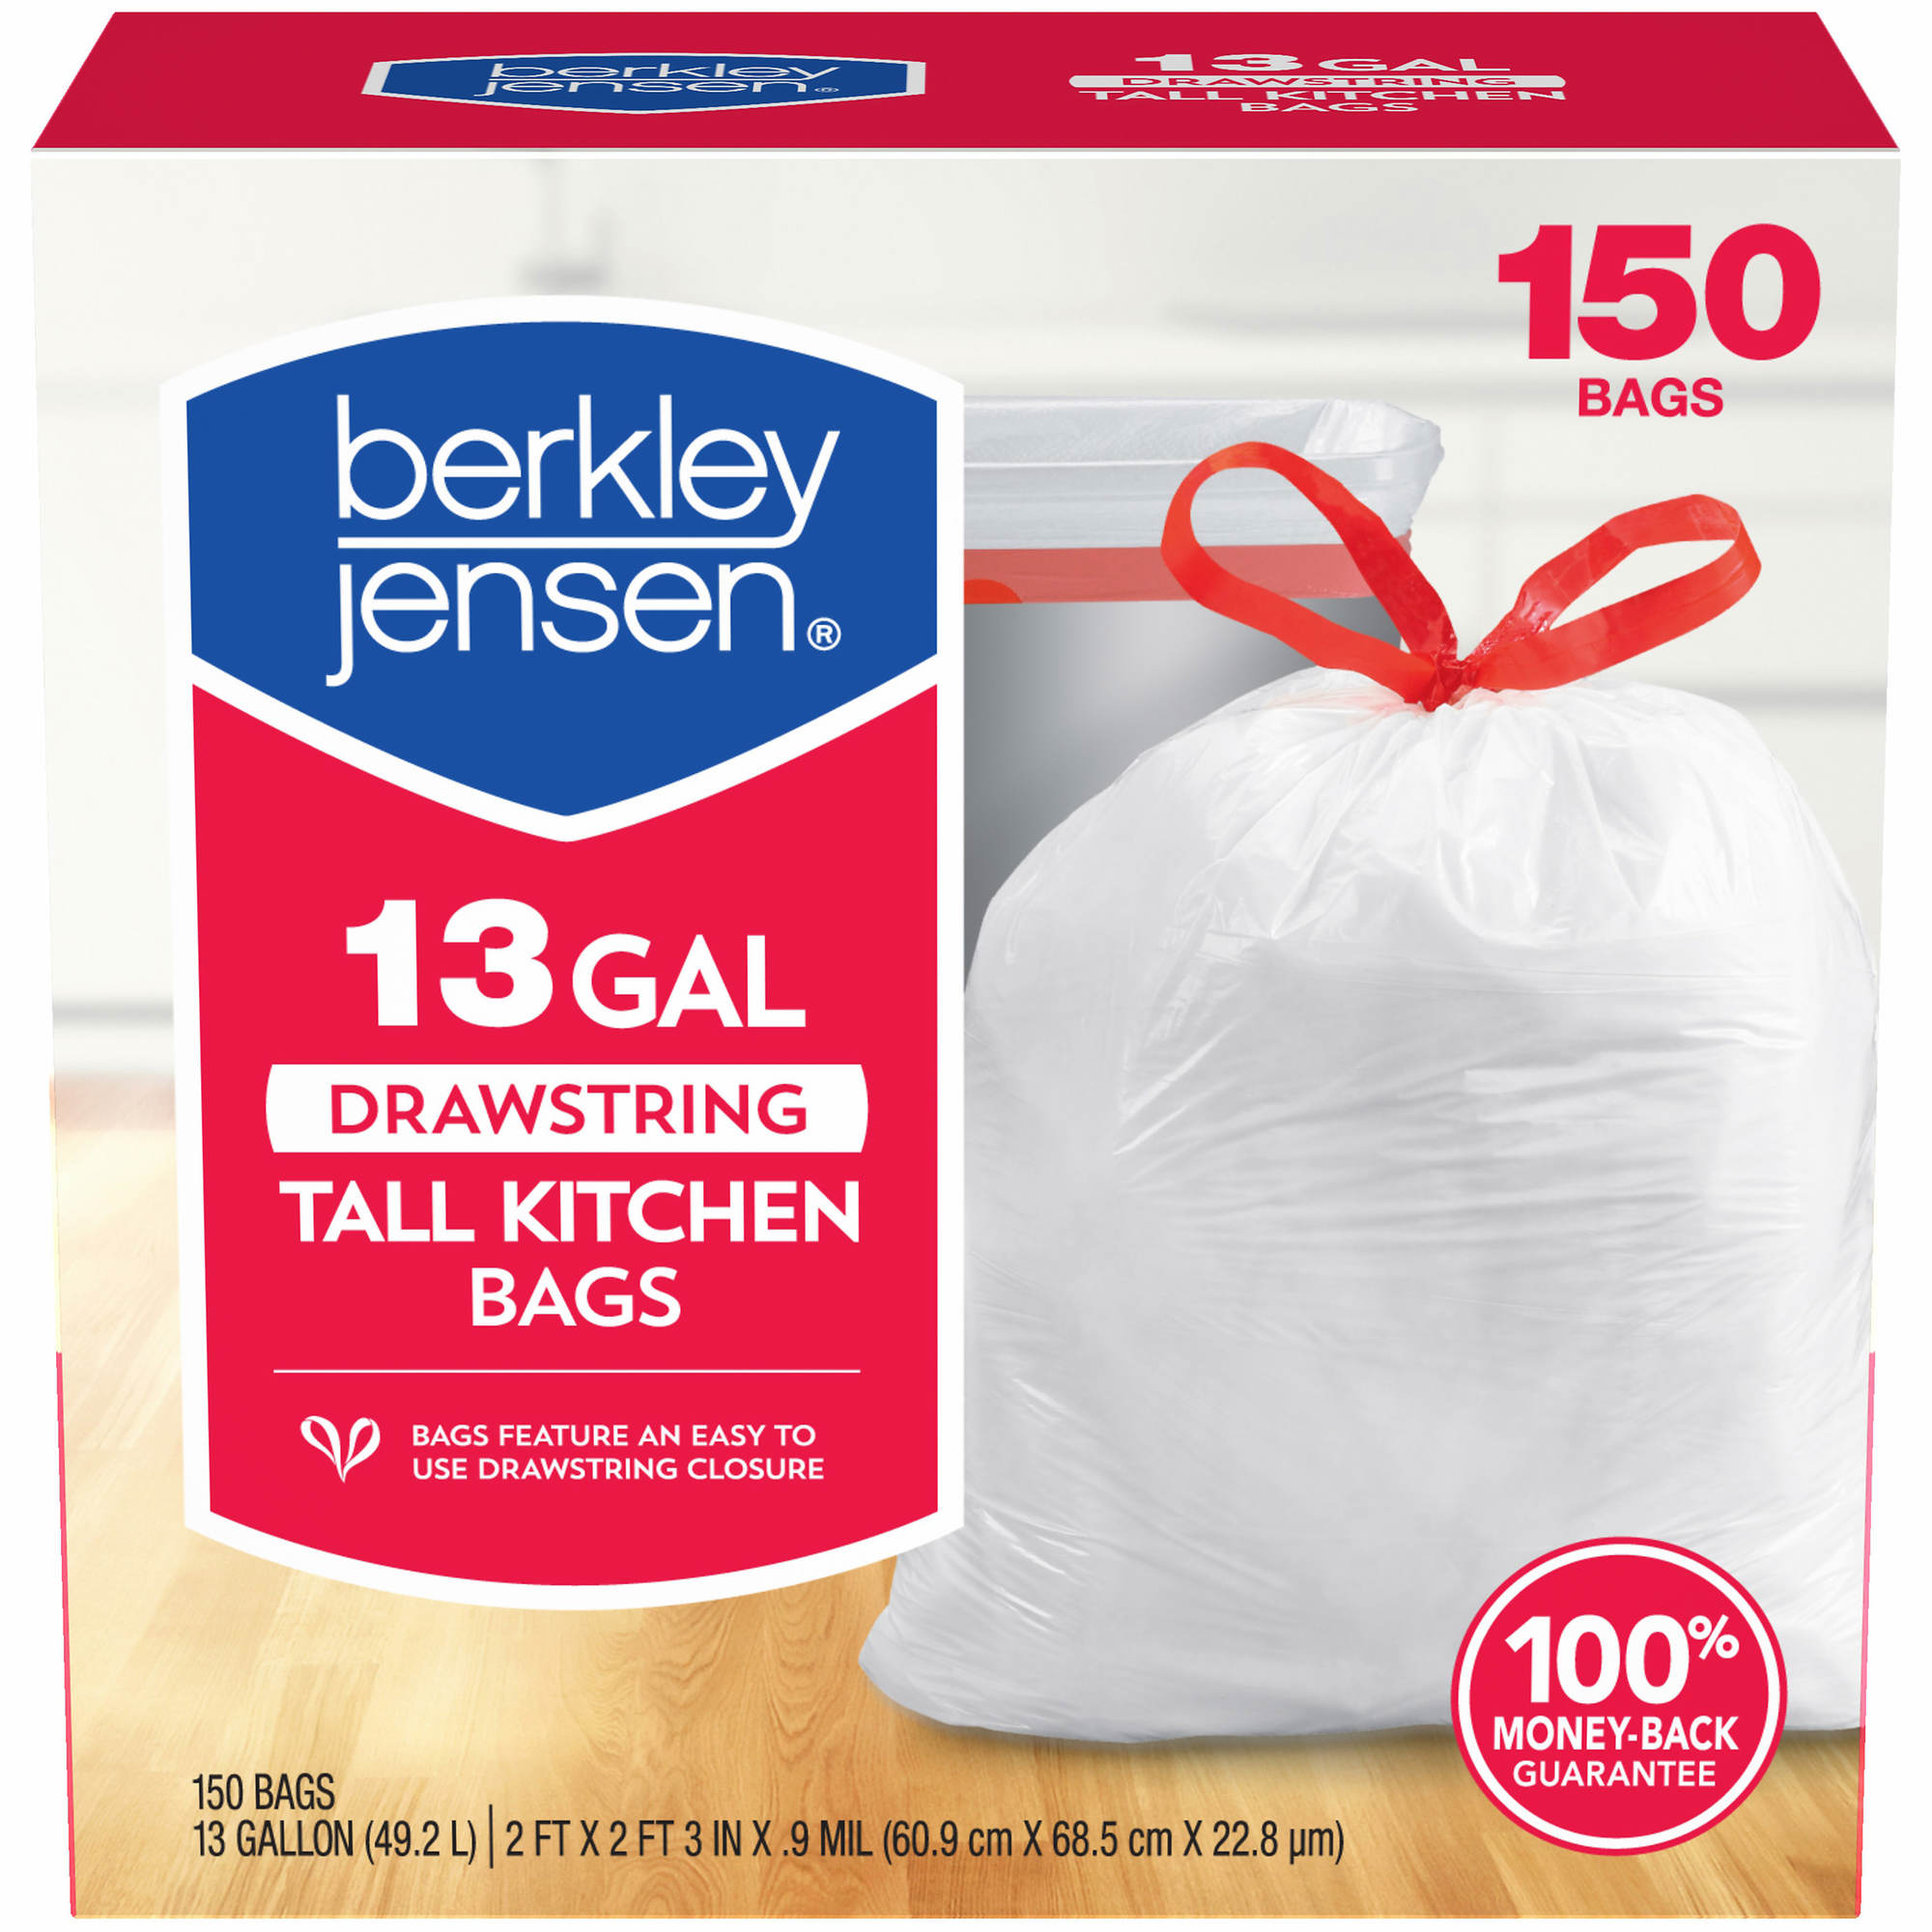 Berkley Jensen 13-Gal. 0.9mil Drawstring Kitchen Bags, 150 ct ...